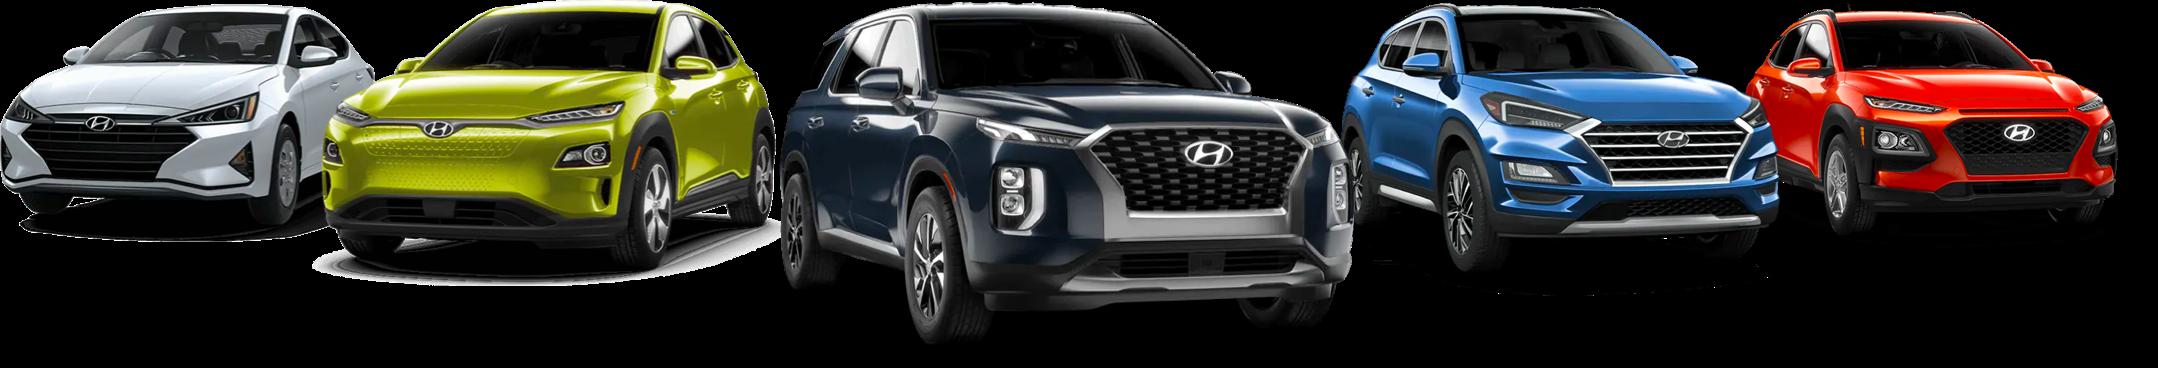 Hyundai All Lineup